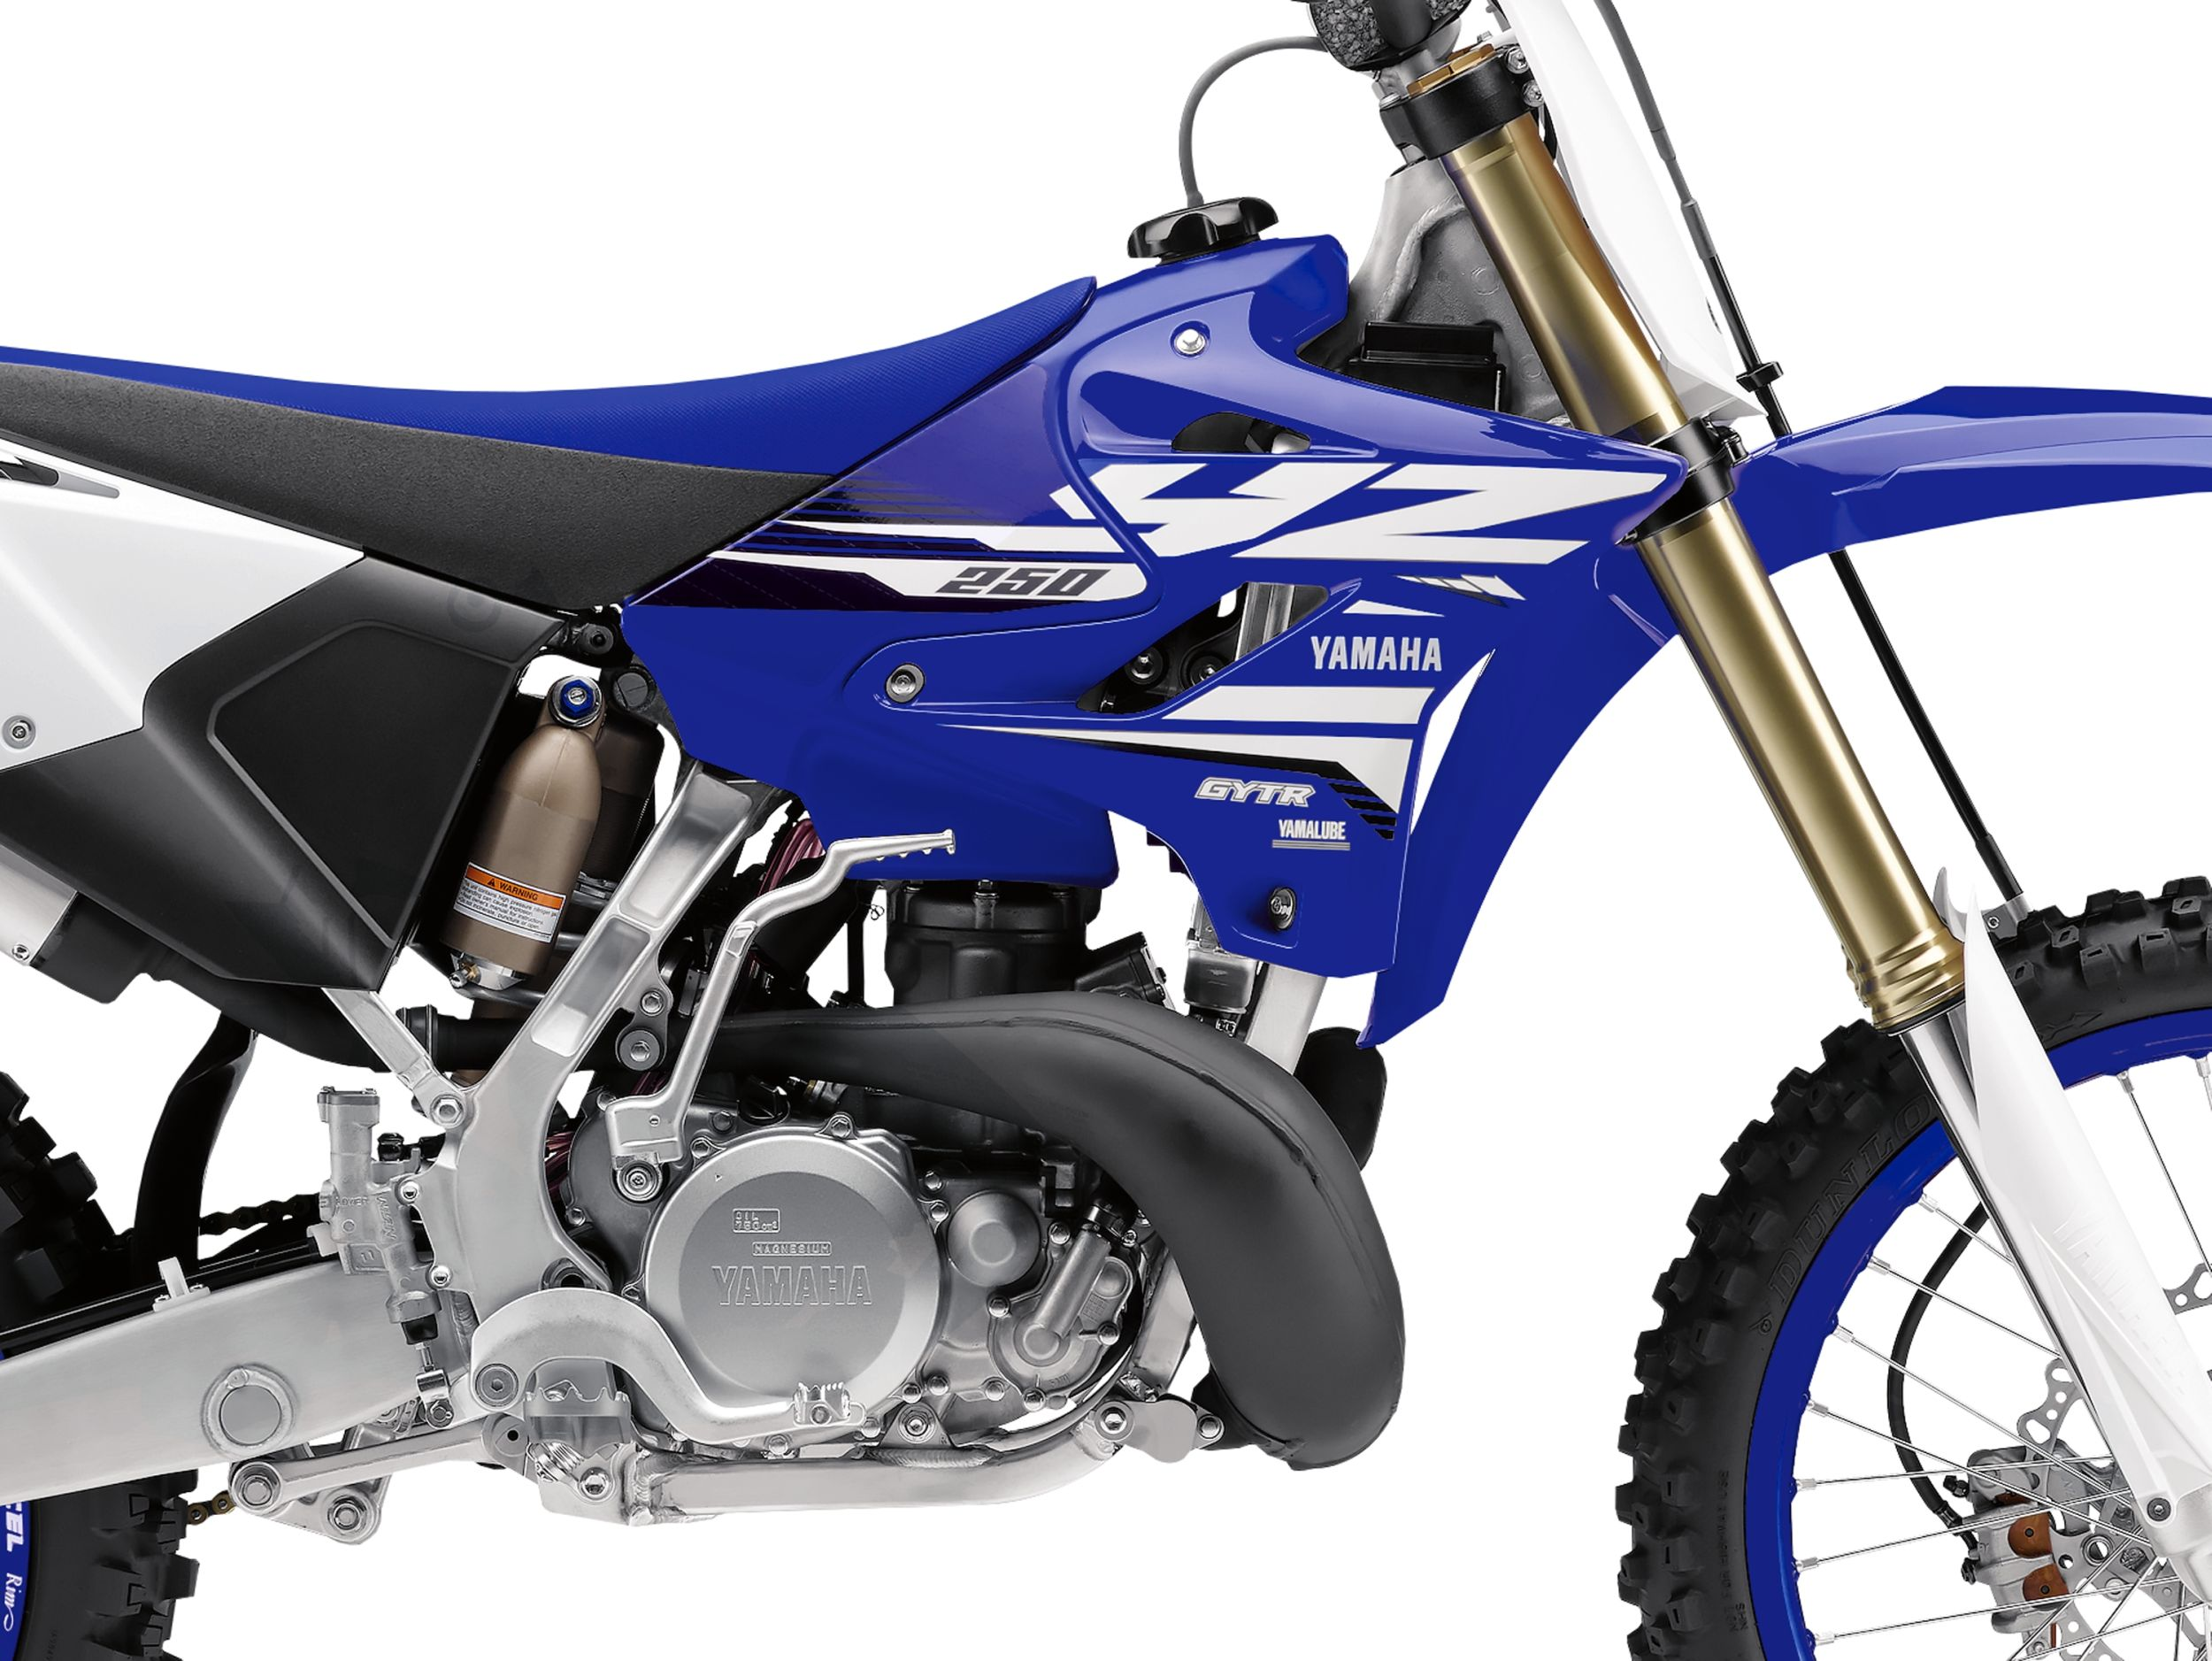 Yamaha YZF-R6 - Alle technischen Daten zum Modell YZF-R6